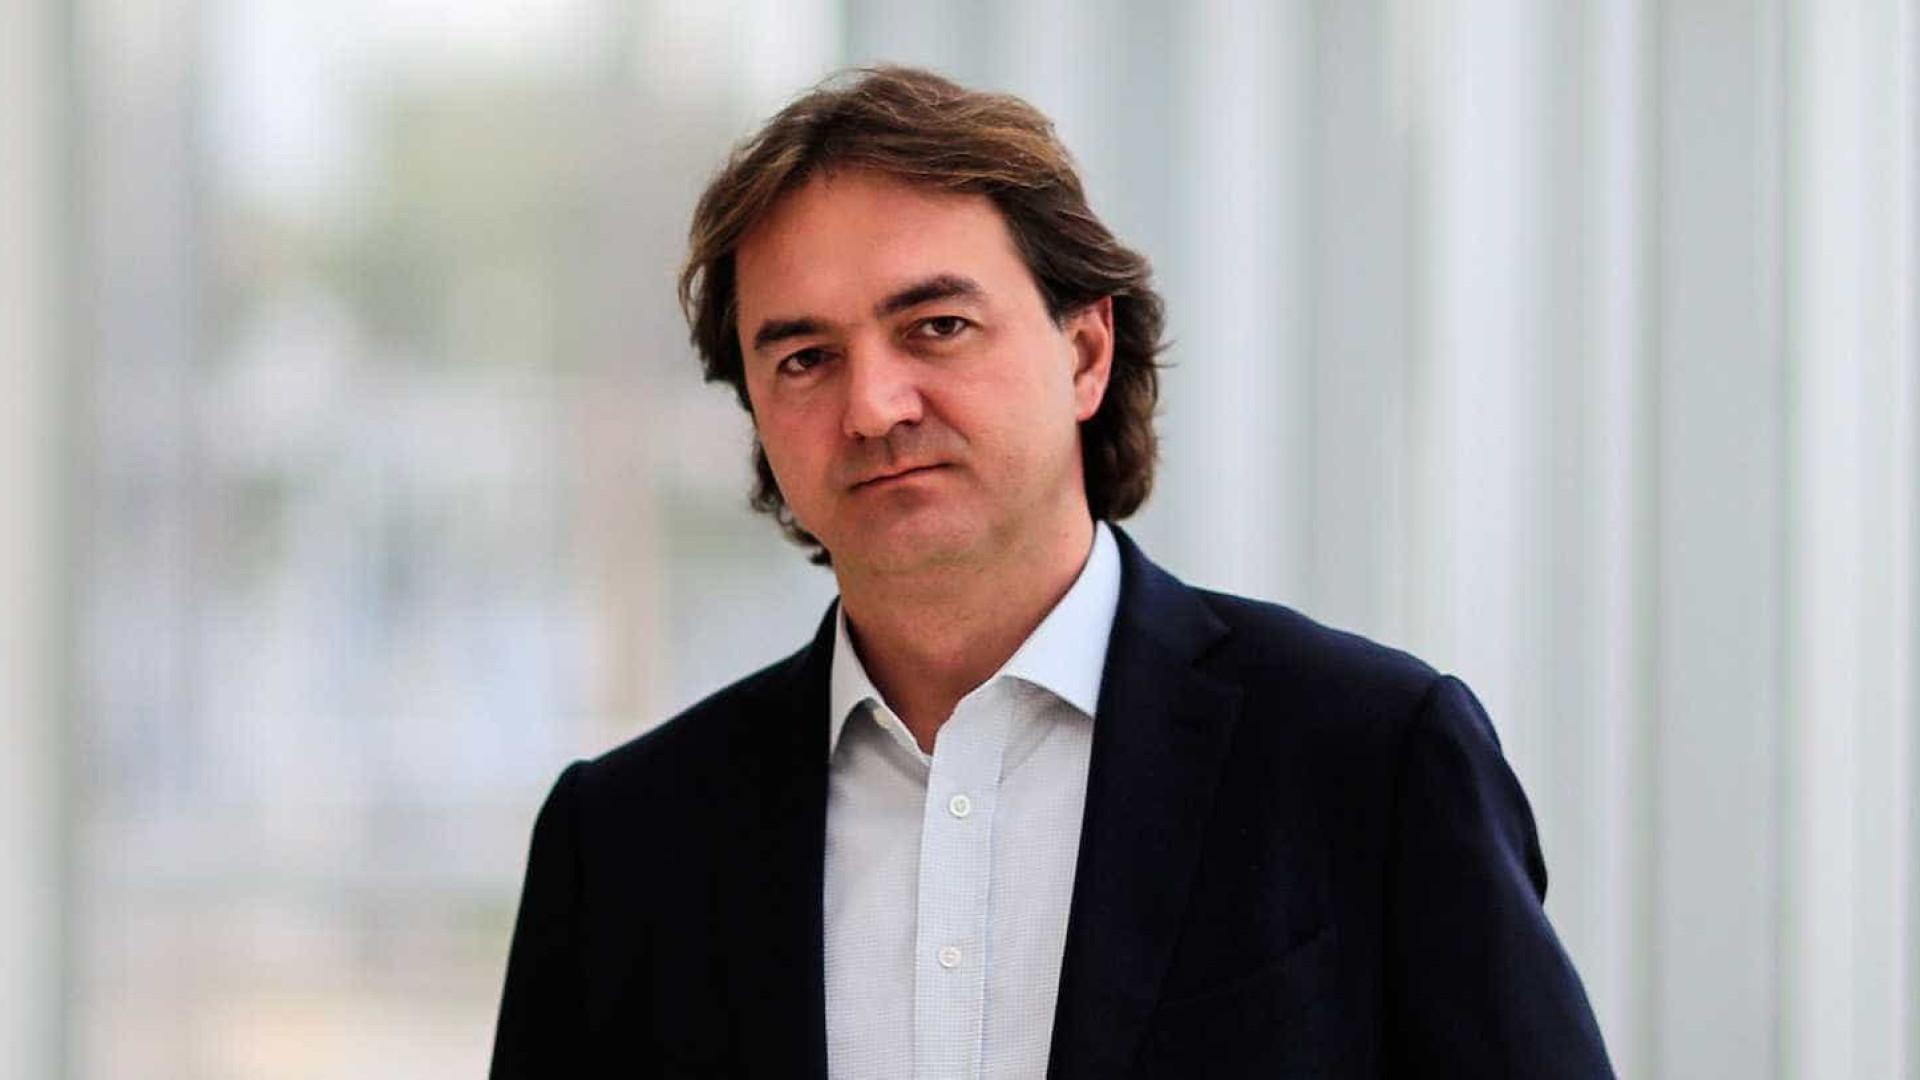 Joesley Batista renuncia à presidência do conselho da JBS